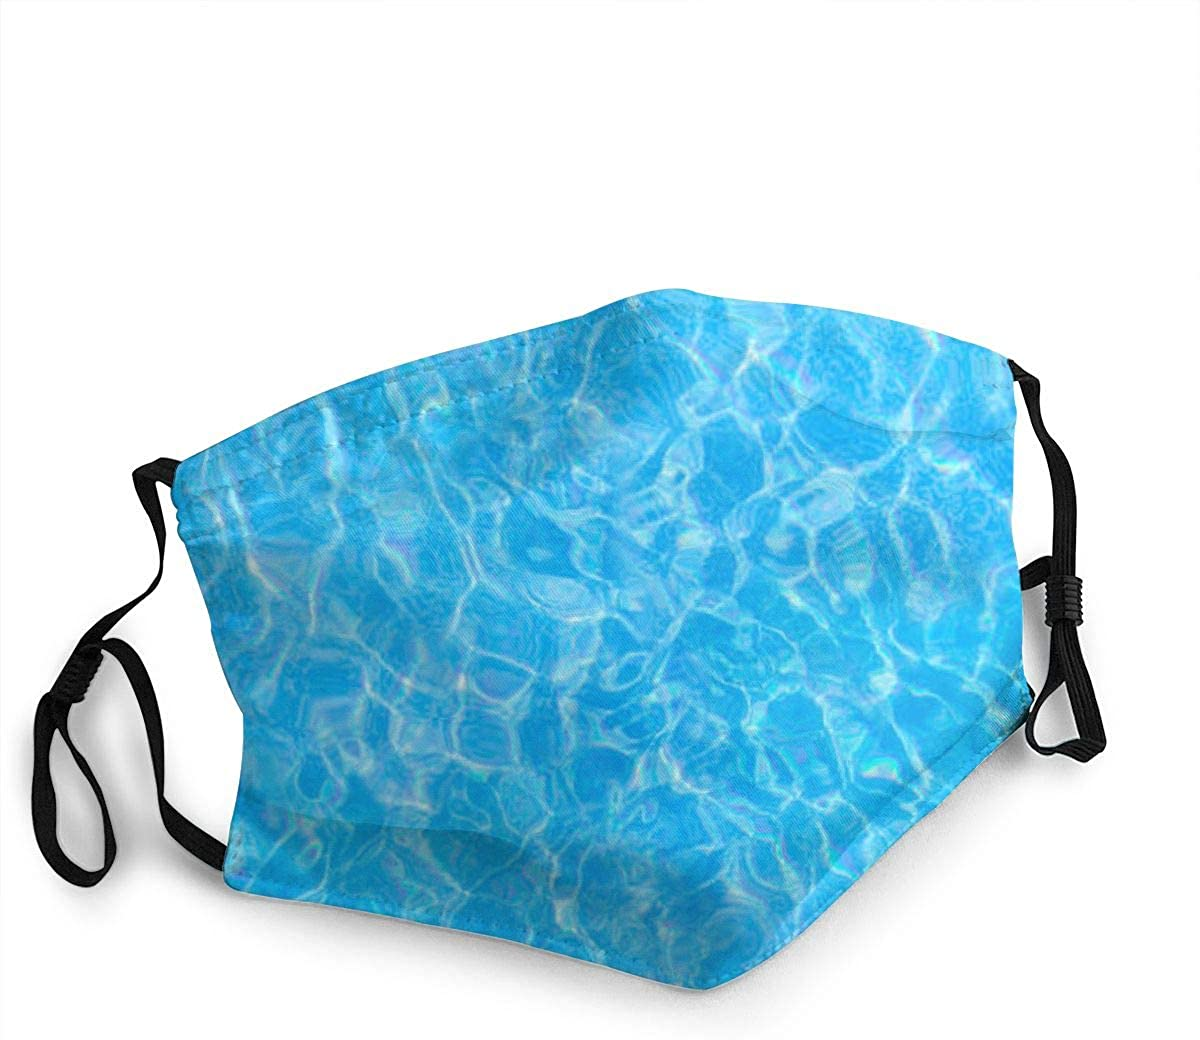 MARTHLORES Fashion Protective, Reusable Cotton Fabric Summer Water Unisex Cotton, Washable,Adjustable, Reusable.